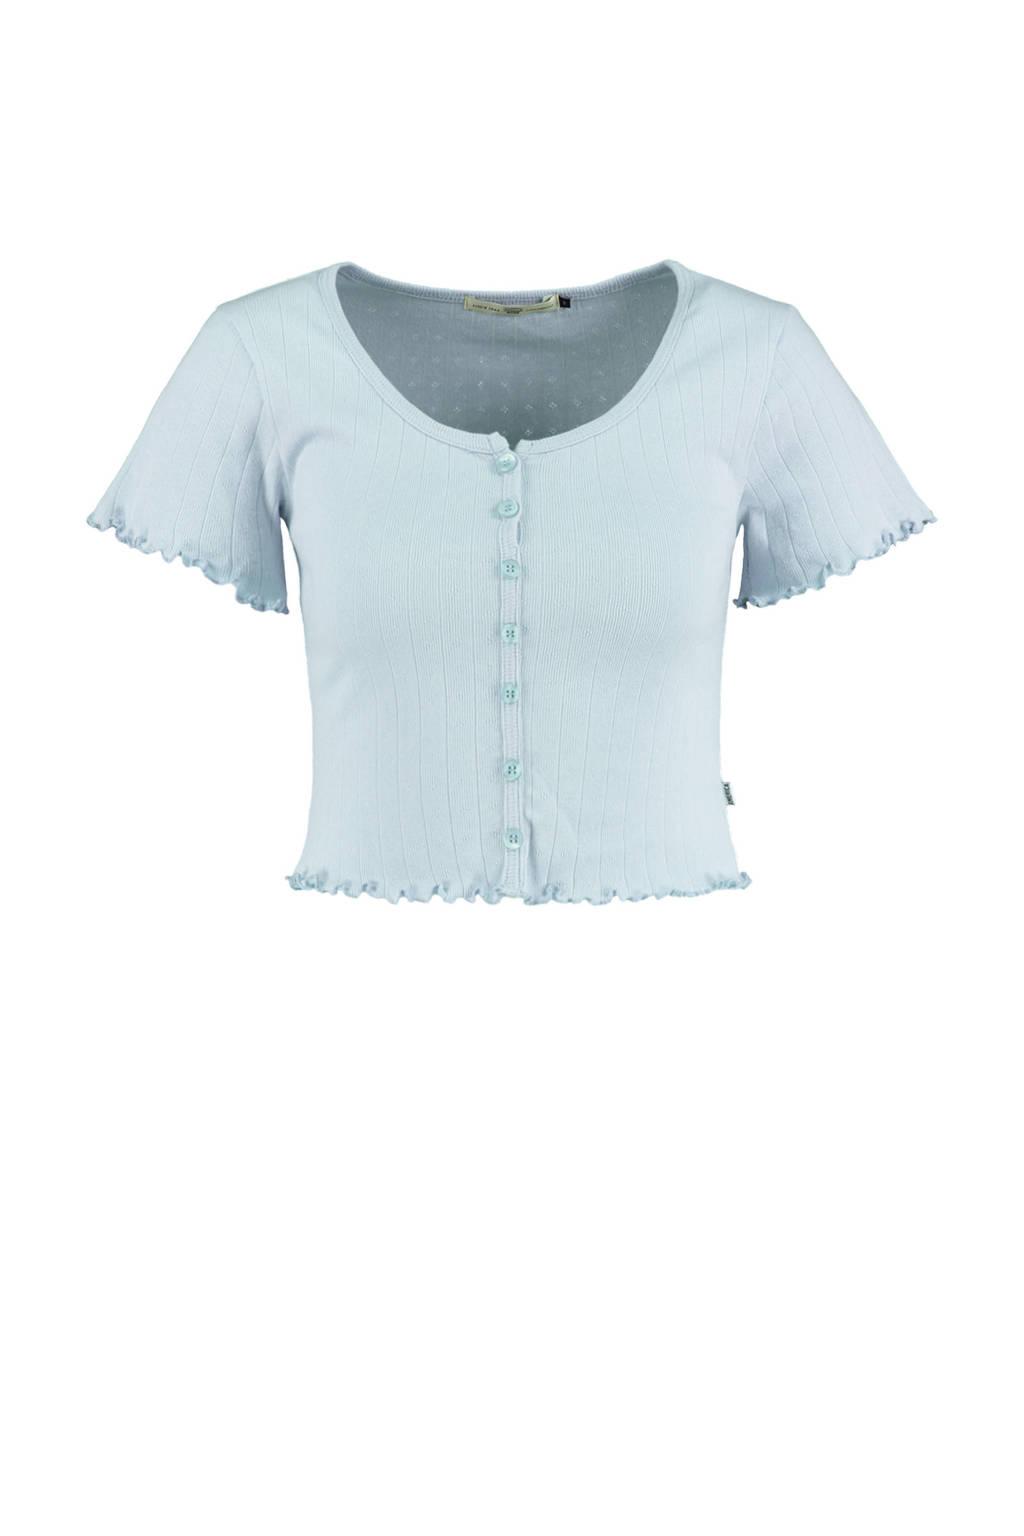 America Today cropped T-shirt lichtblauw, BabyBlue